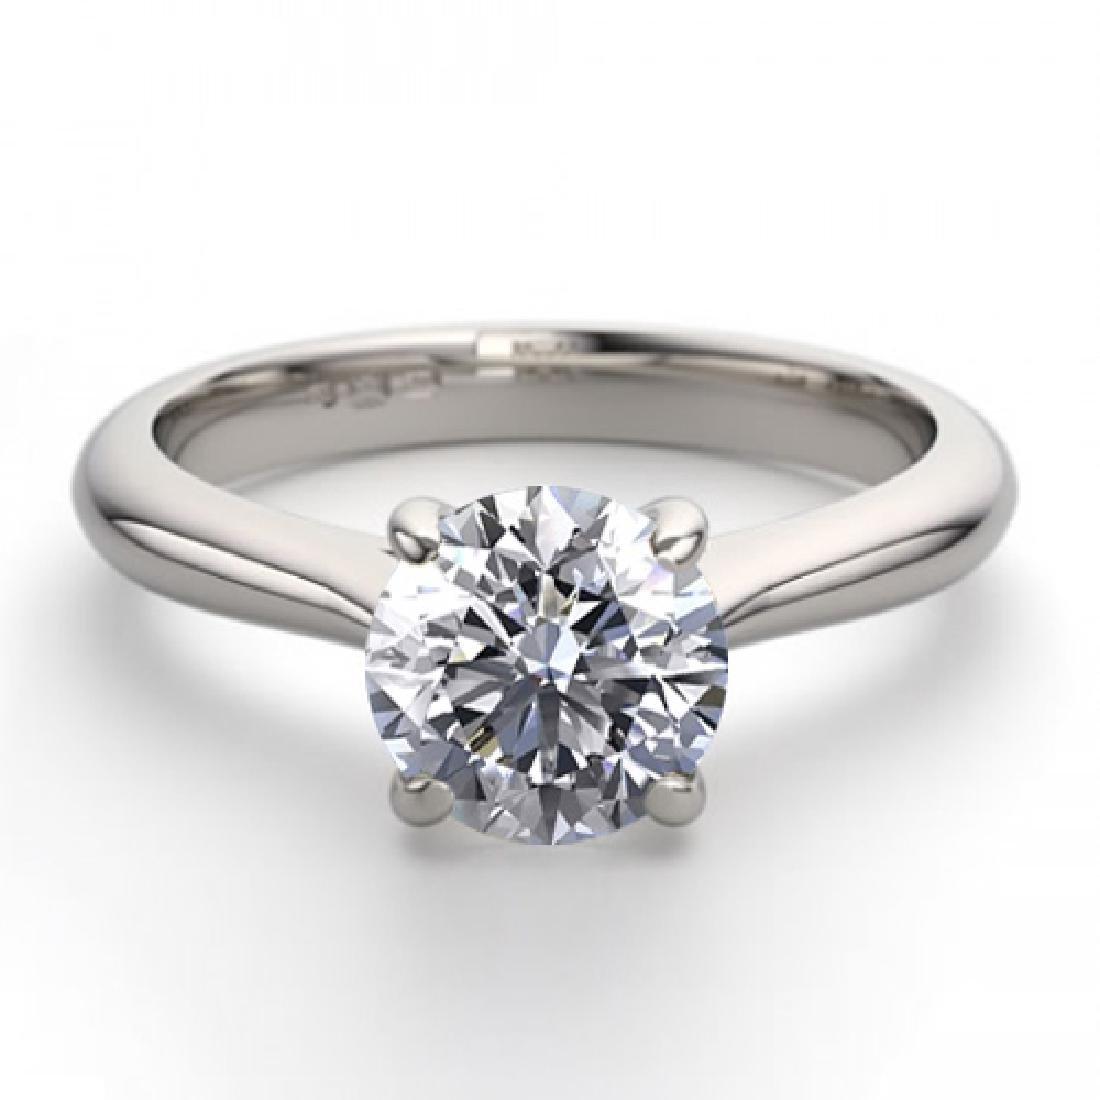 14K White Gold Jewelry 0.91 ctw Natural Diamond